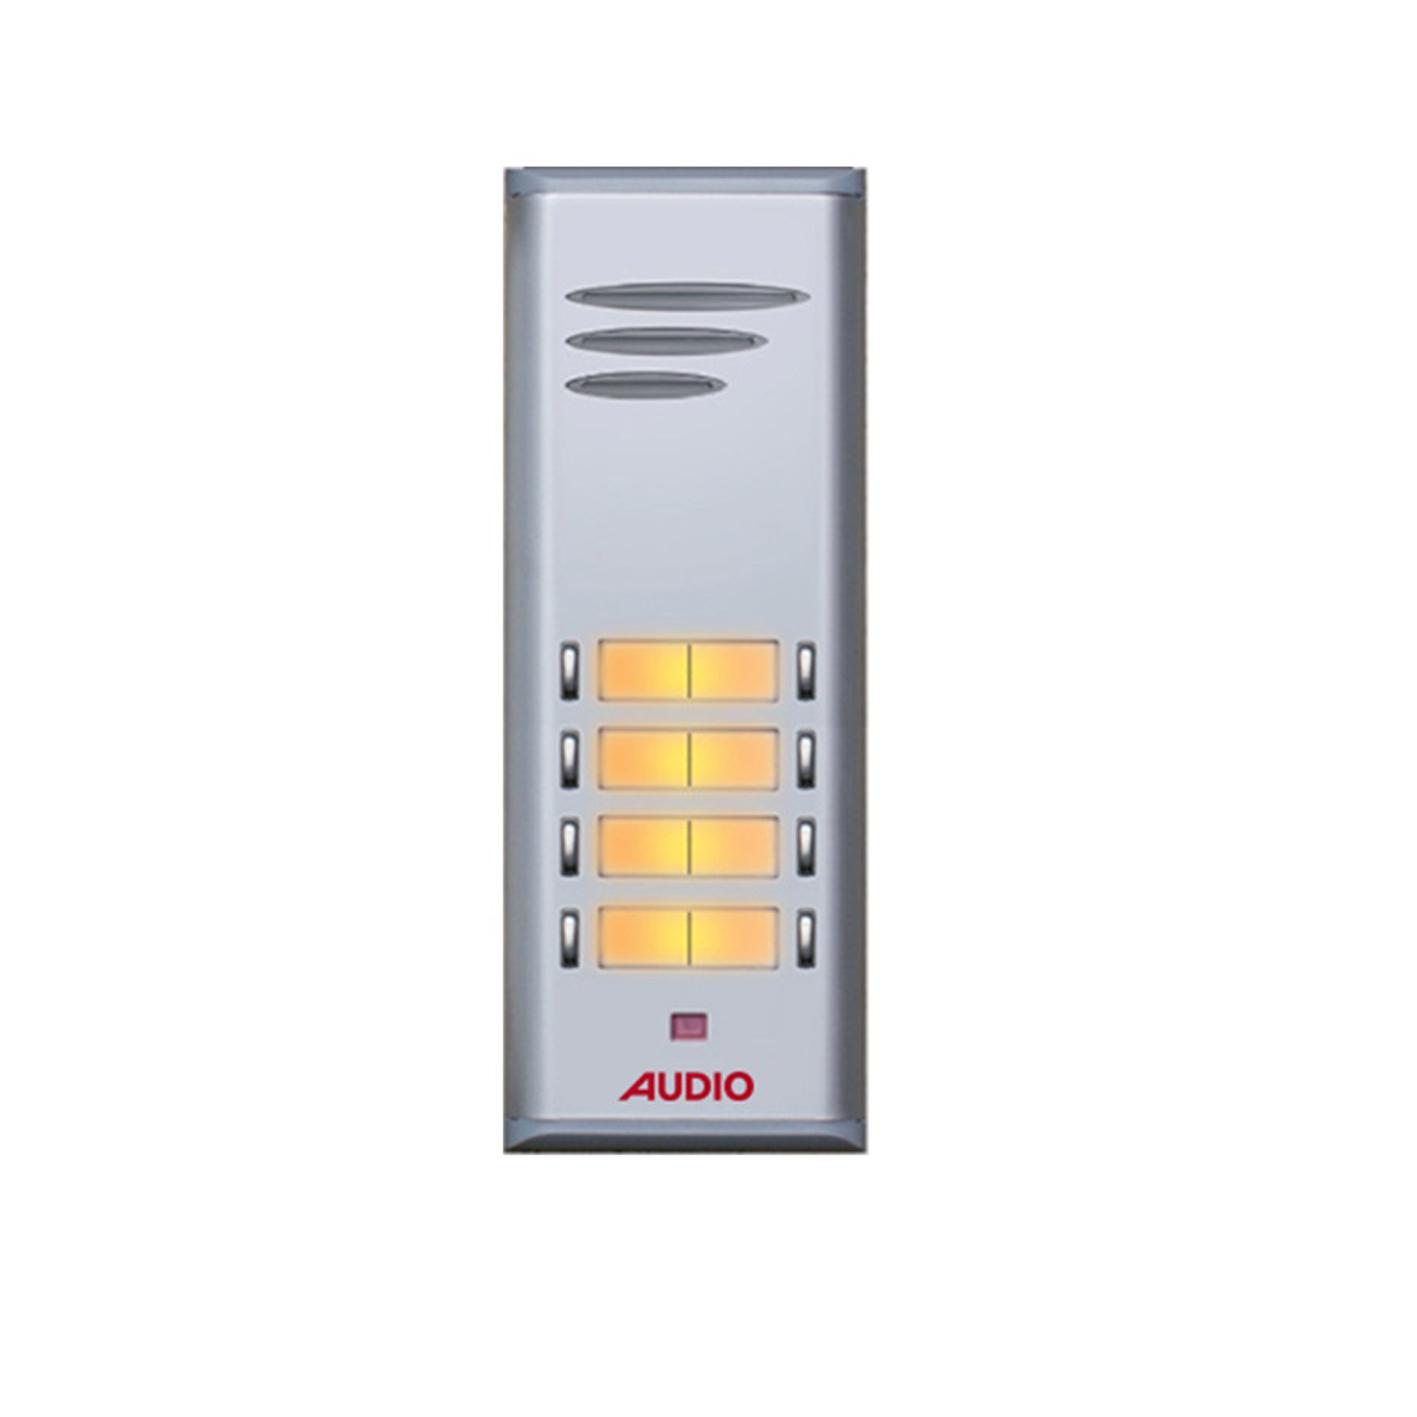 Audio 8'li HP'li Çift Sıra Zil Paneli